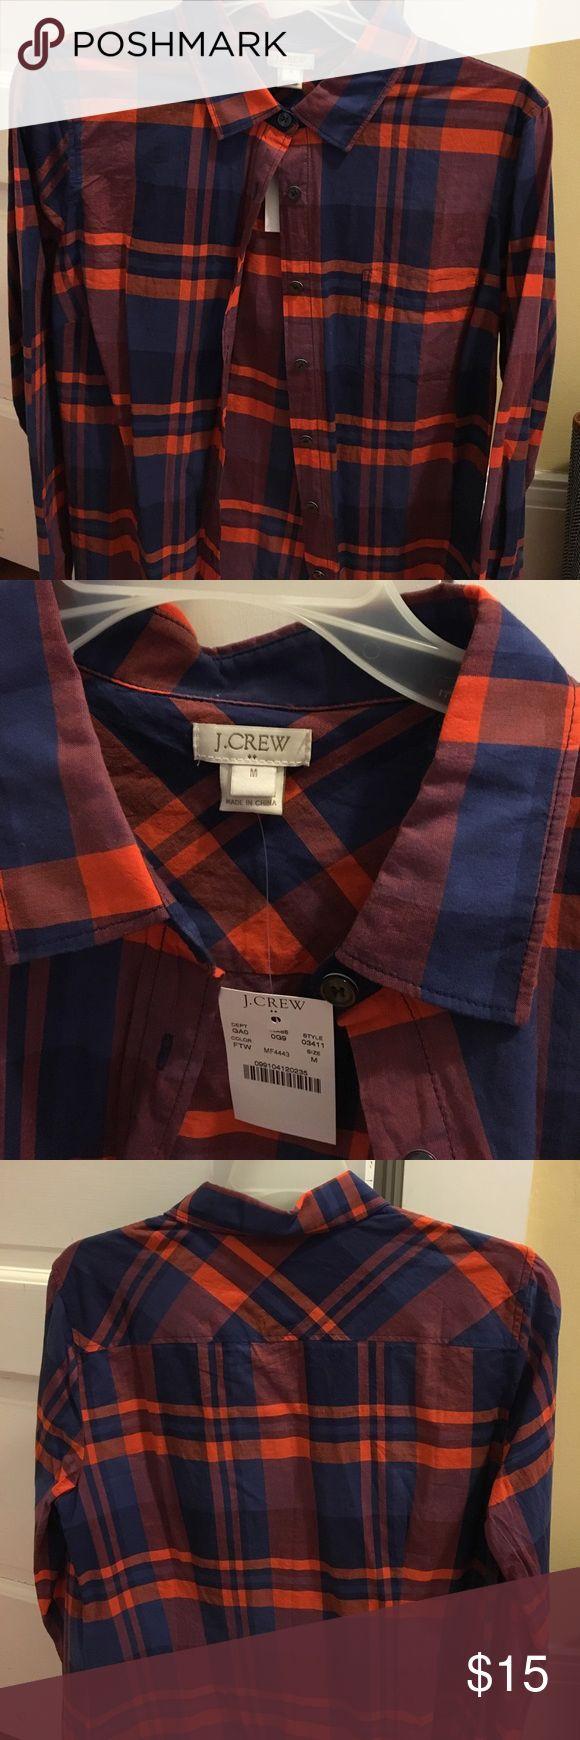 J Crew Factory Women's button down shirt. NWT J Crew Factory Women's Plaid Burton down. New with tags! J. Crew Factory Tops Button Down Shirts